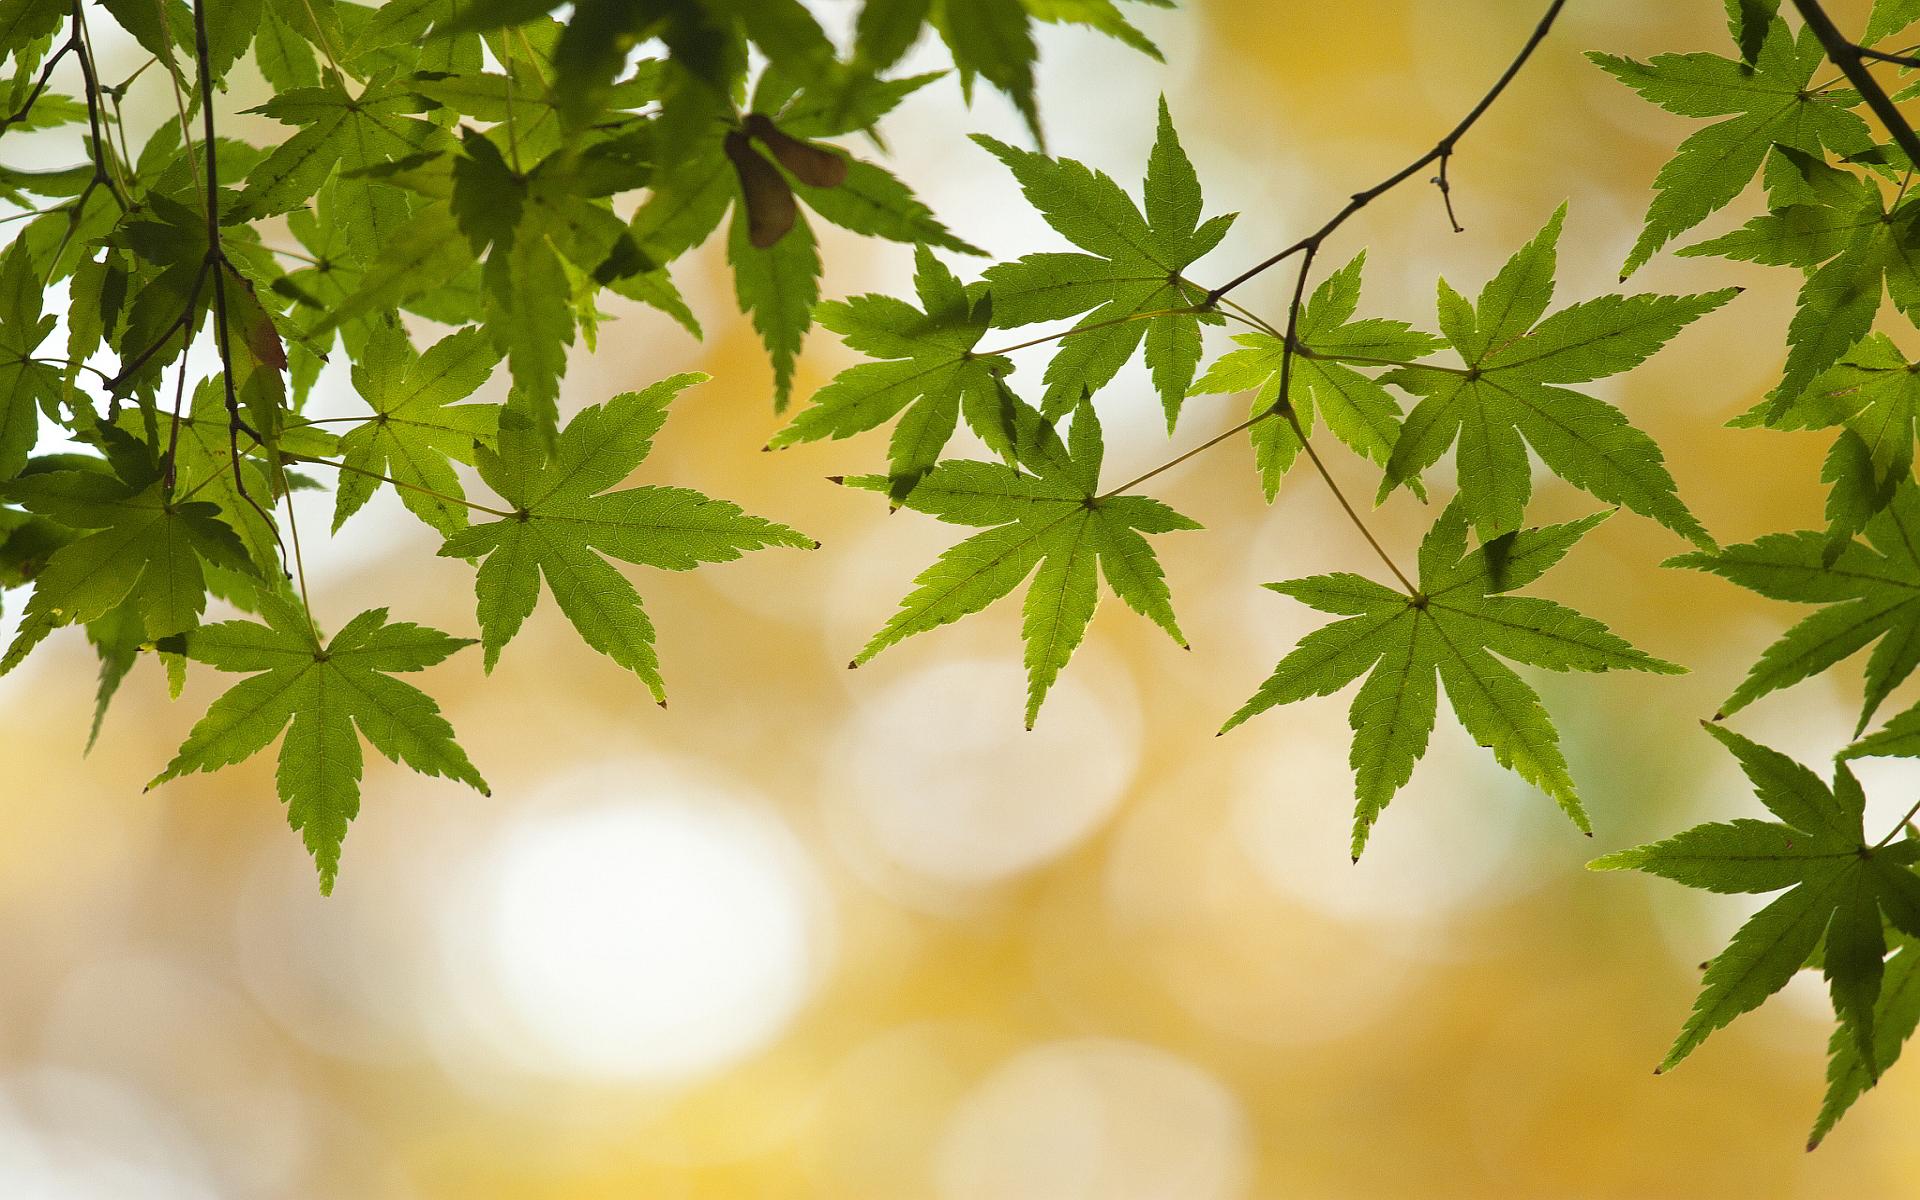 Green leaves summer